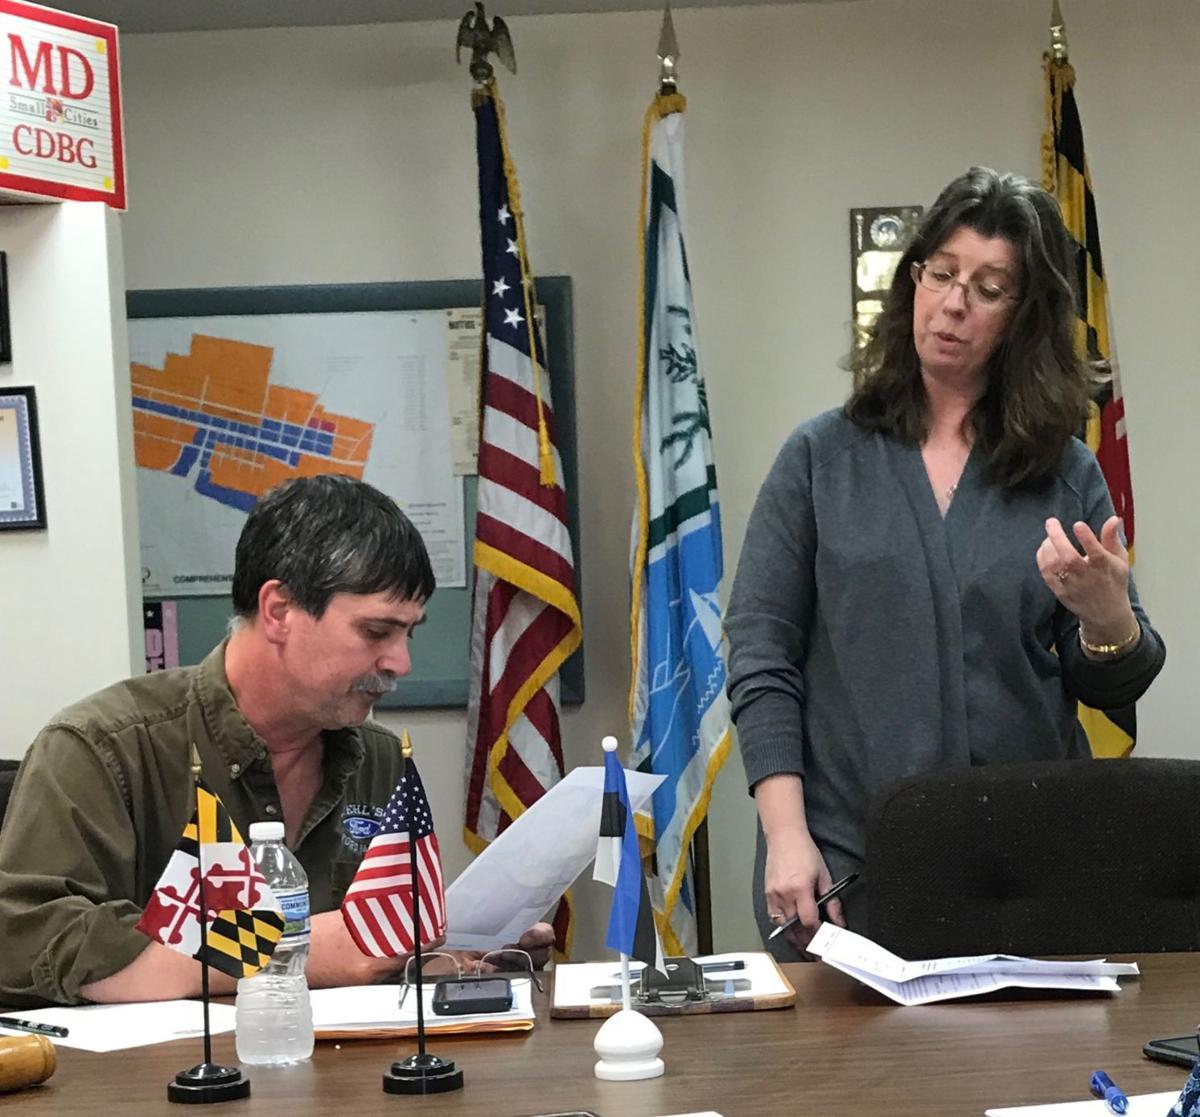 Mayor Diehl and Administrator Jones